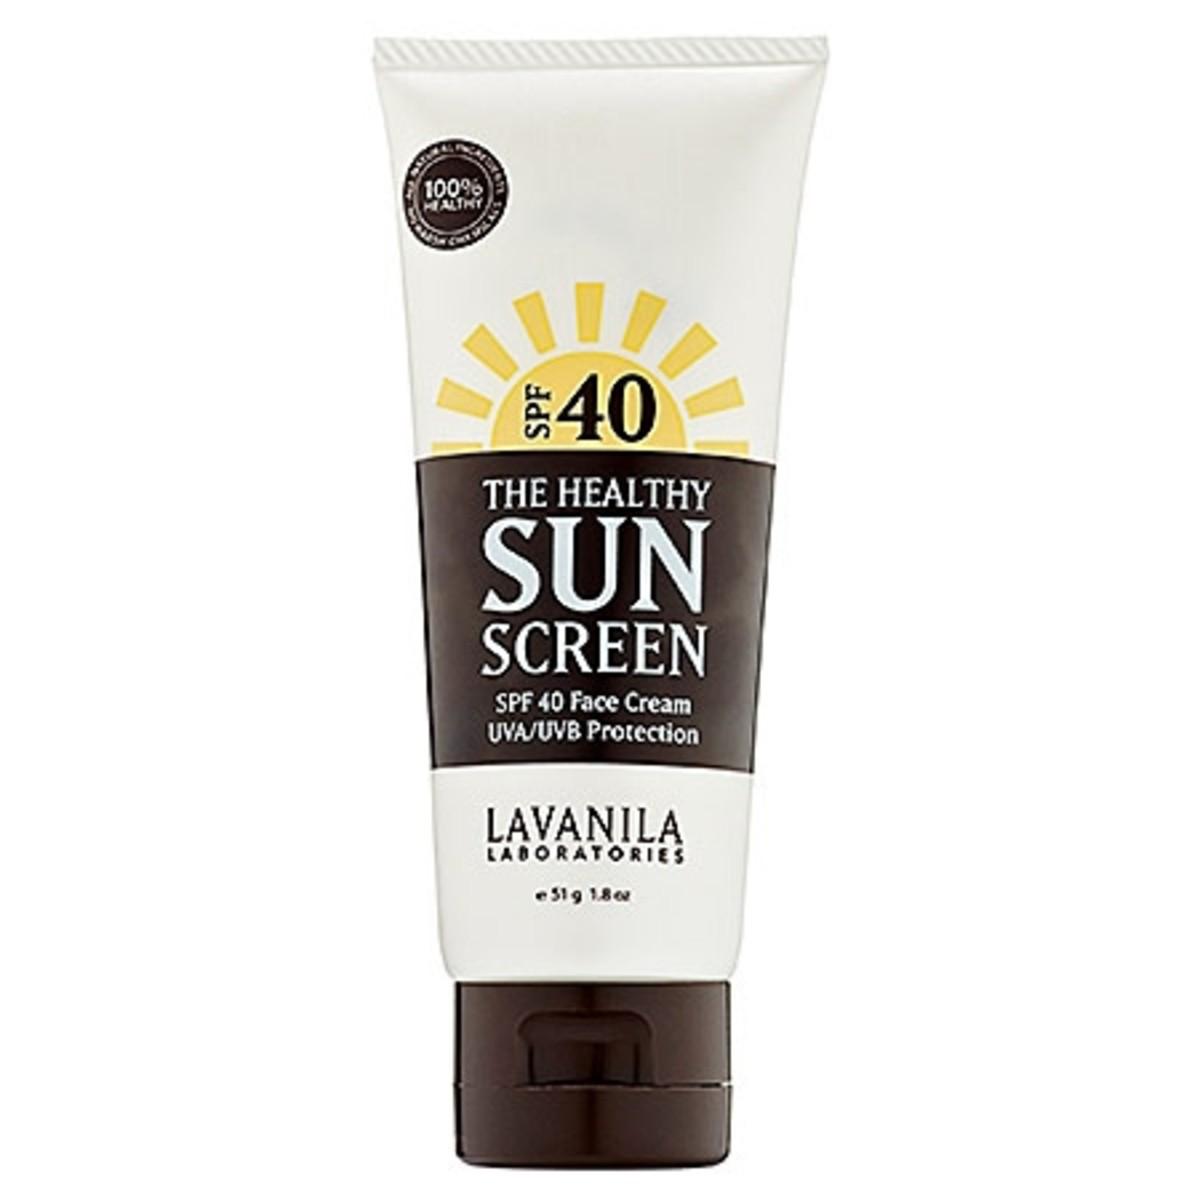 Lavanila The Healthy Sunscreen